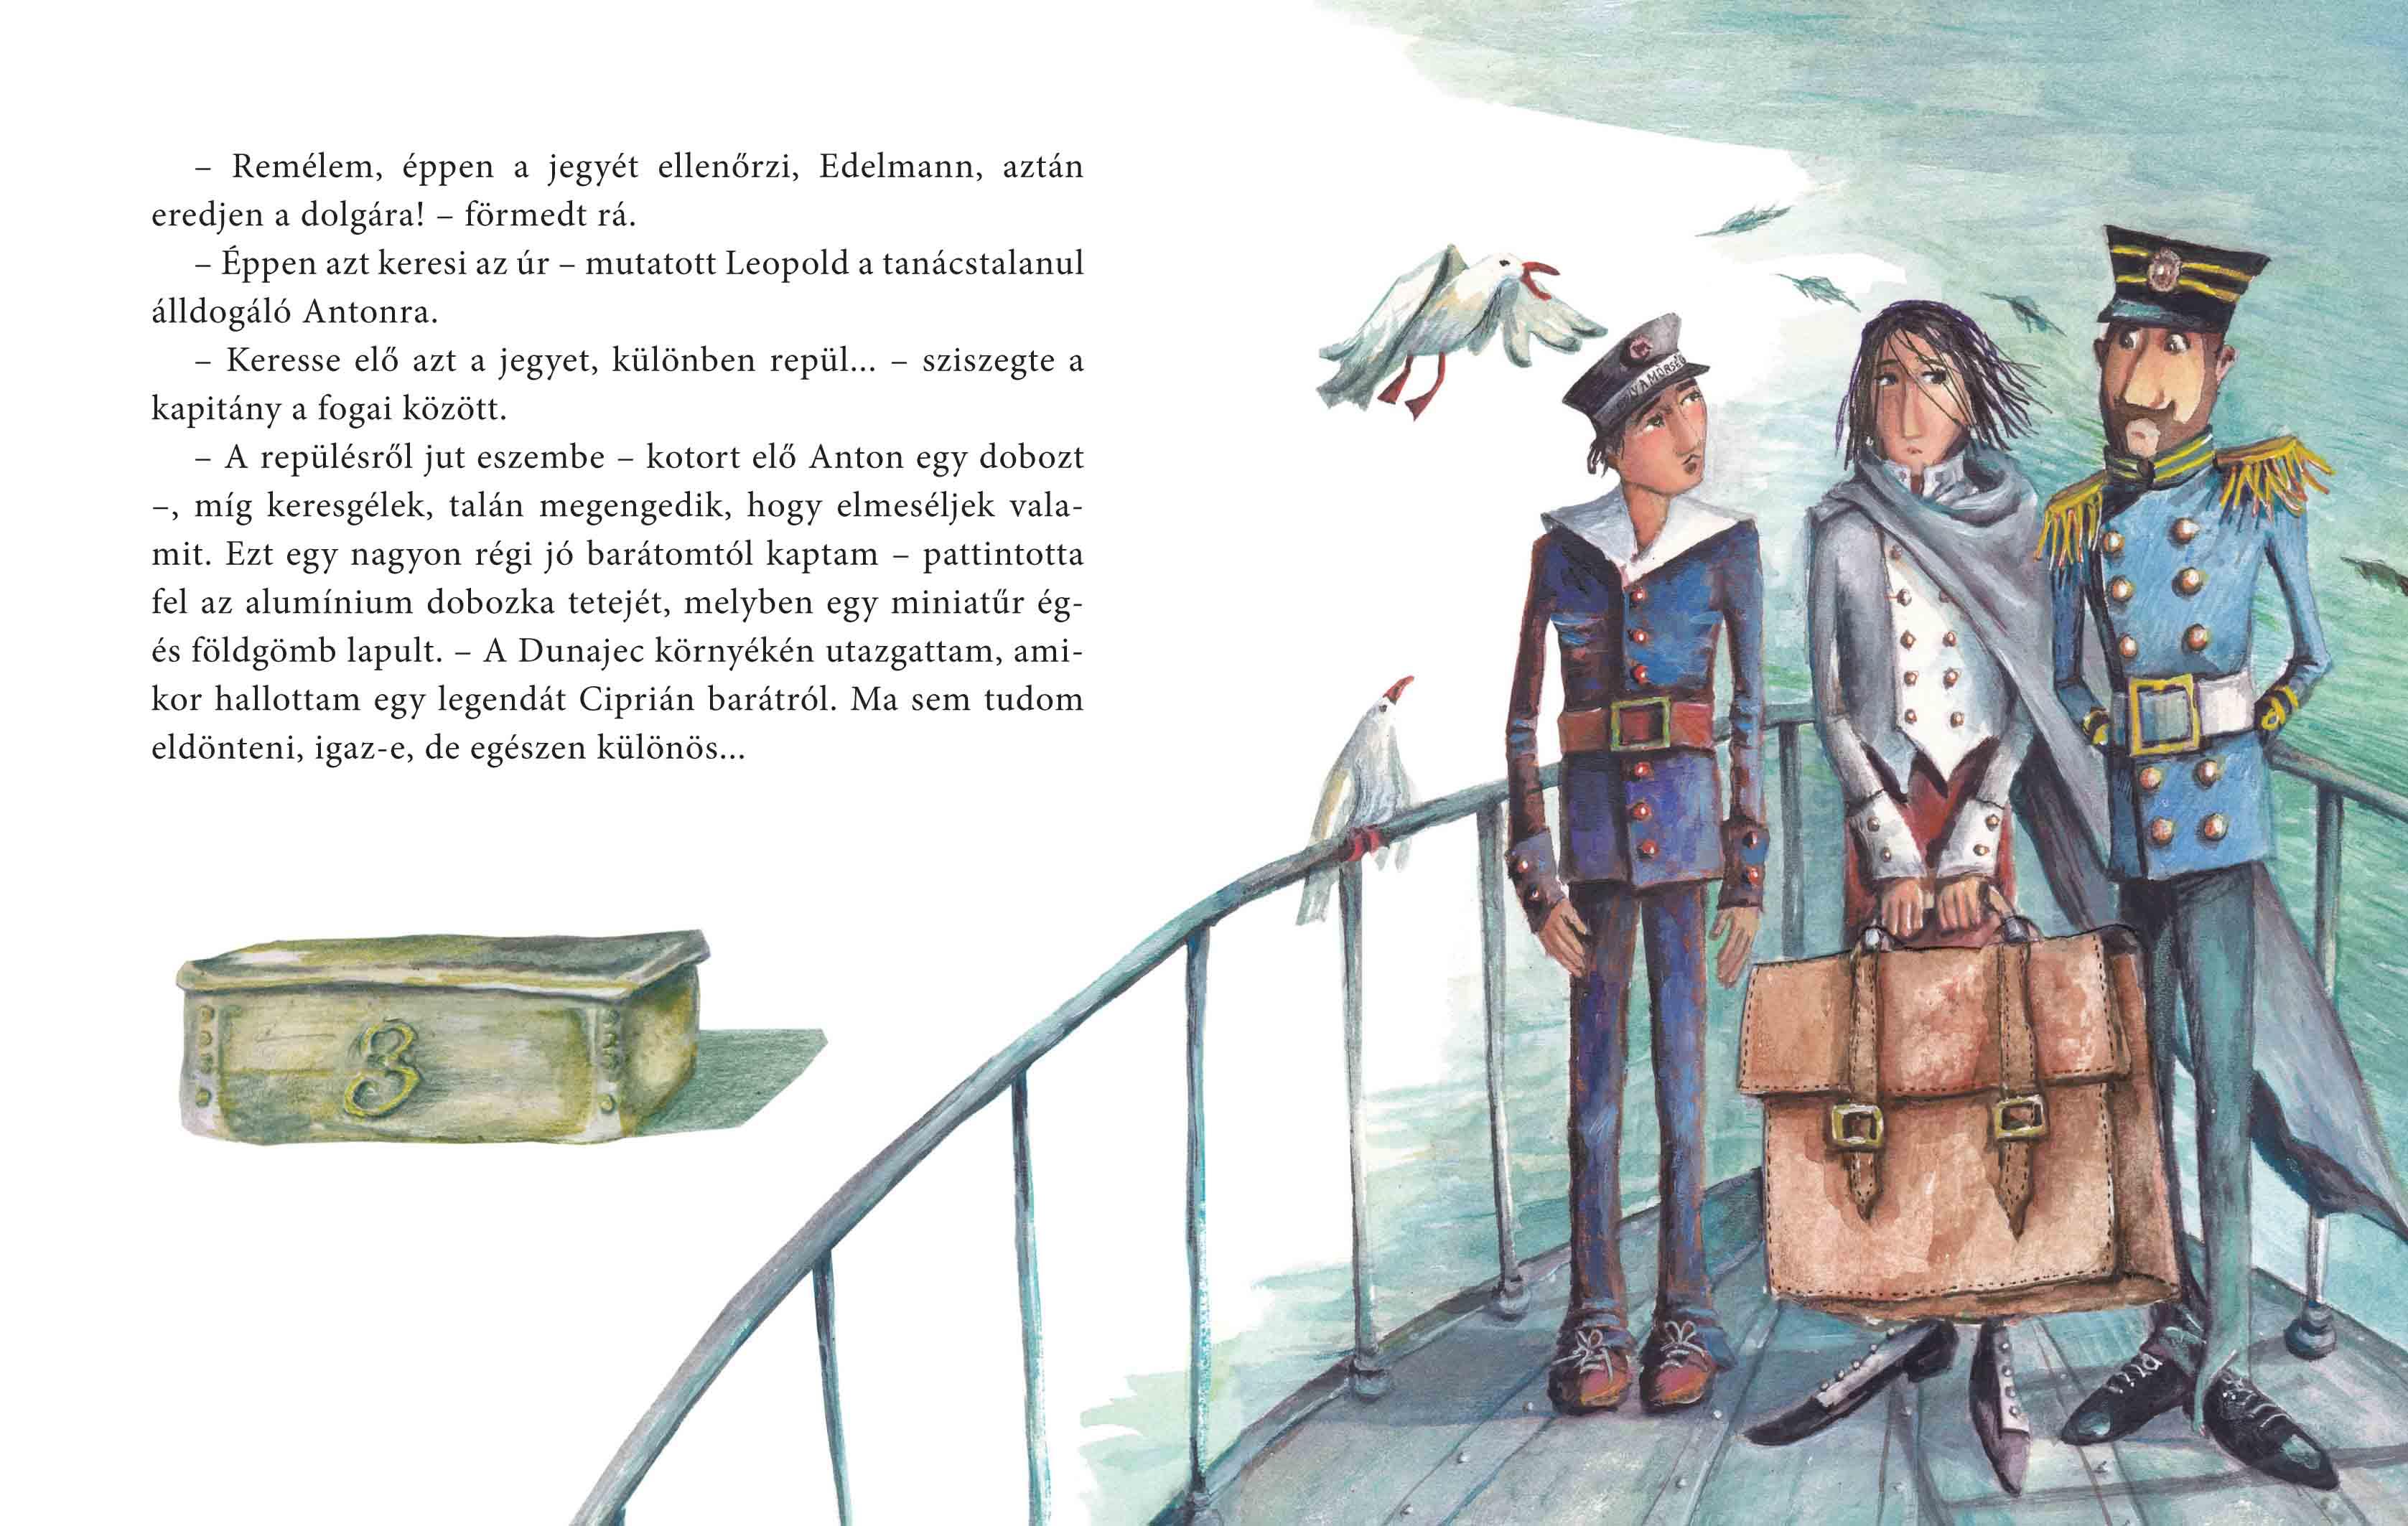 http://www.holnapkiado.hu//upload/books/5736/Pannonia_beliv_2.jpg